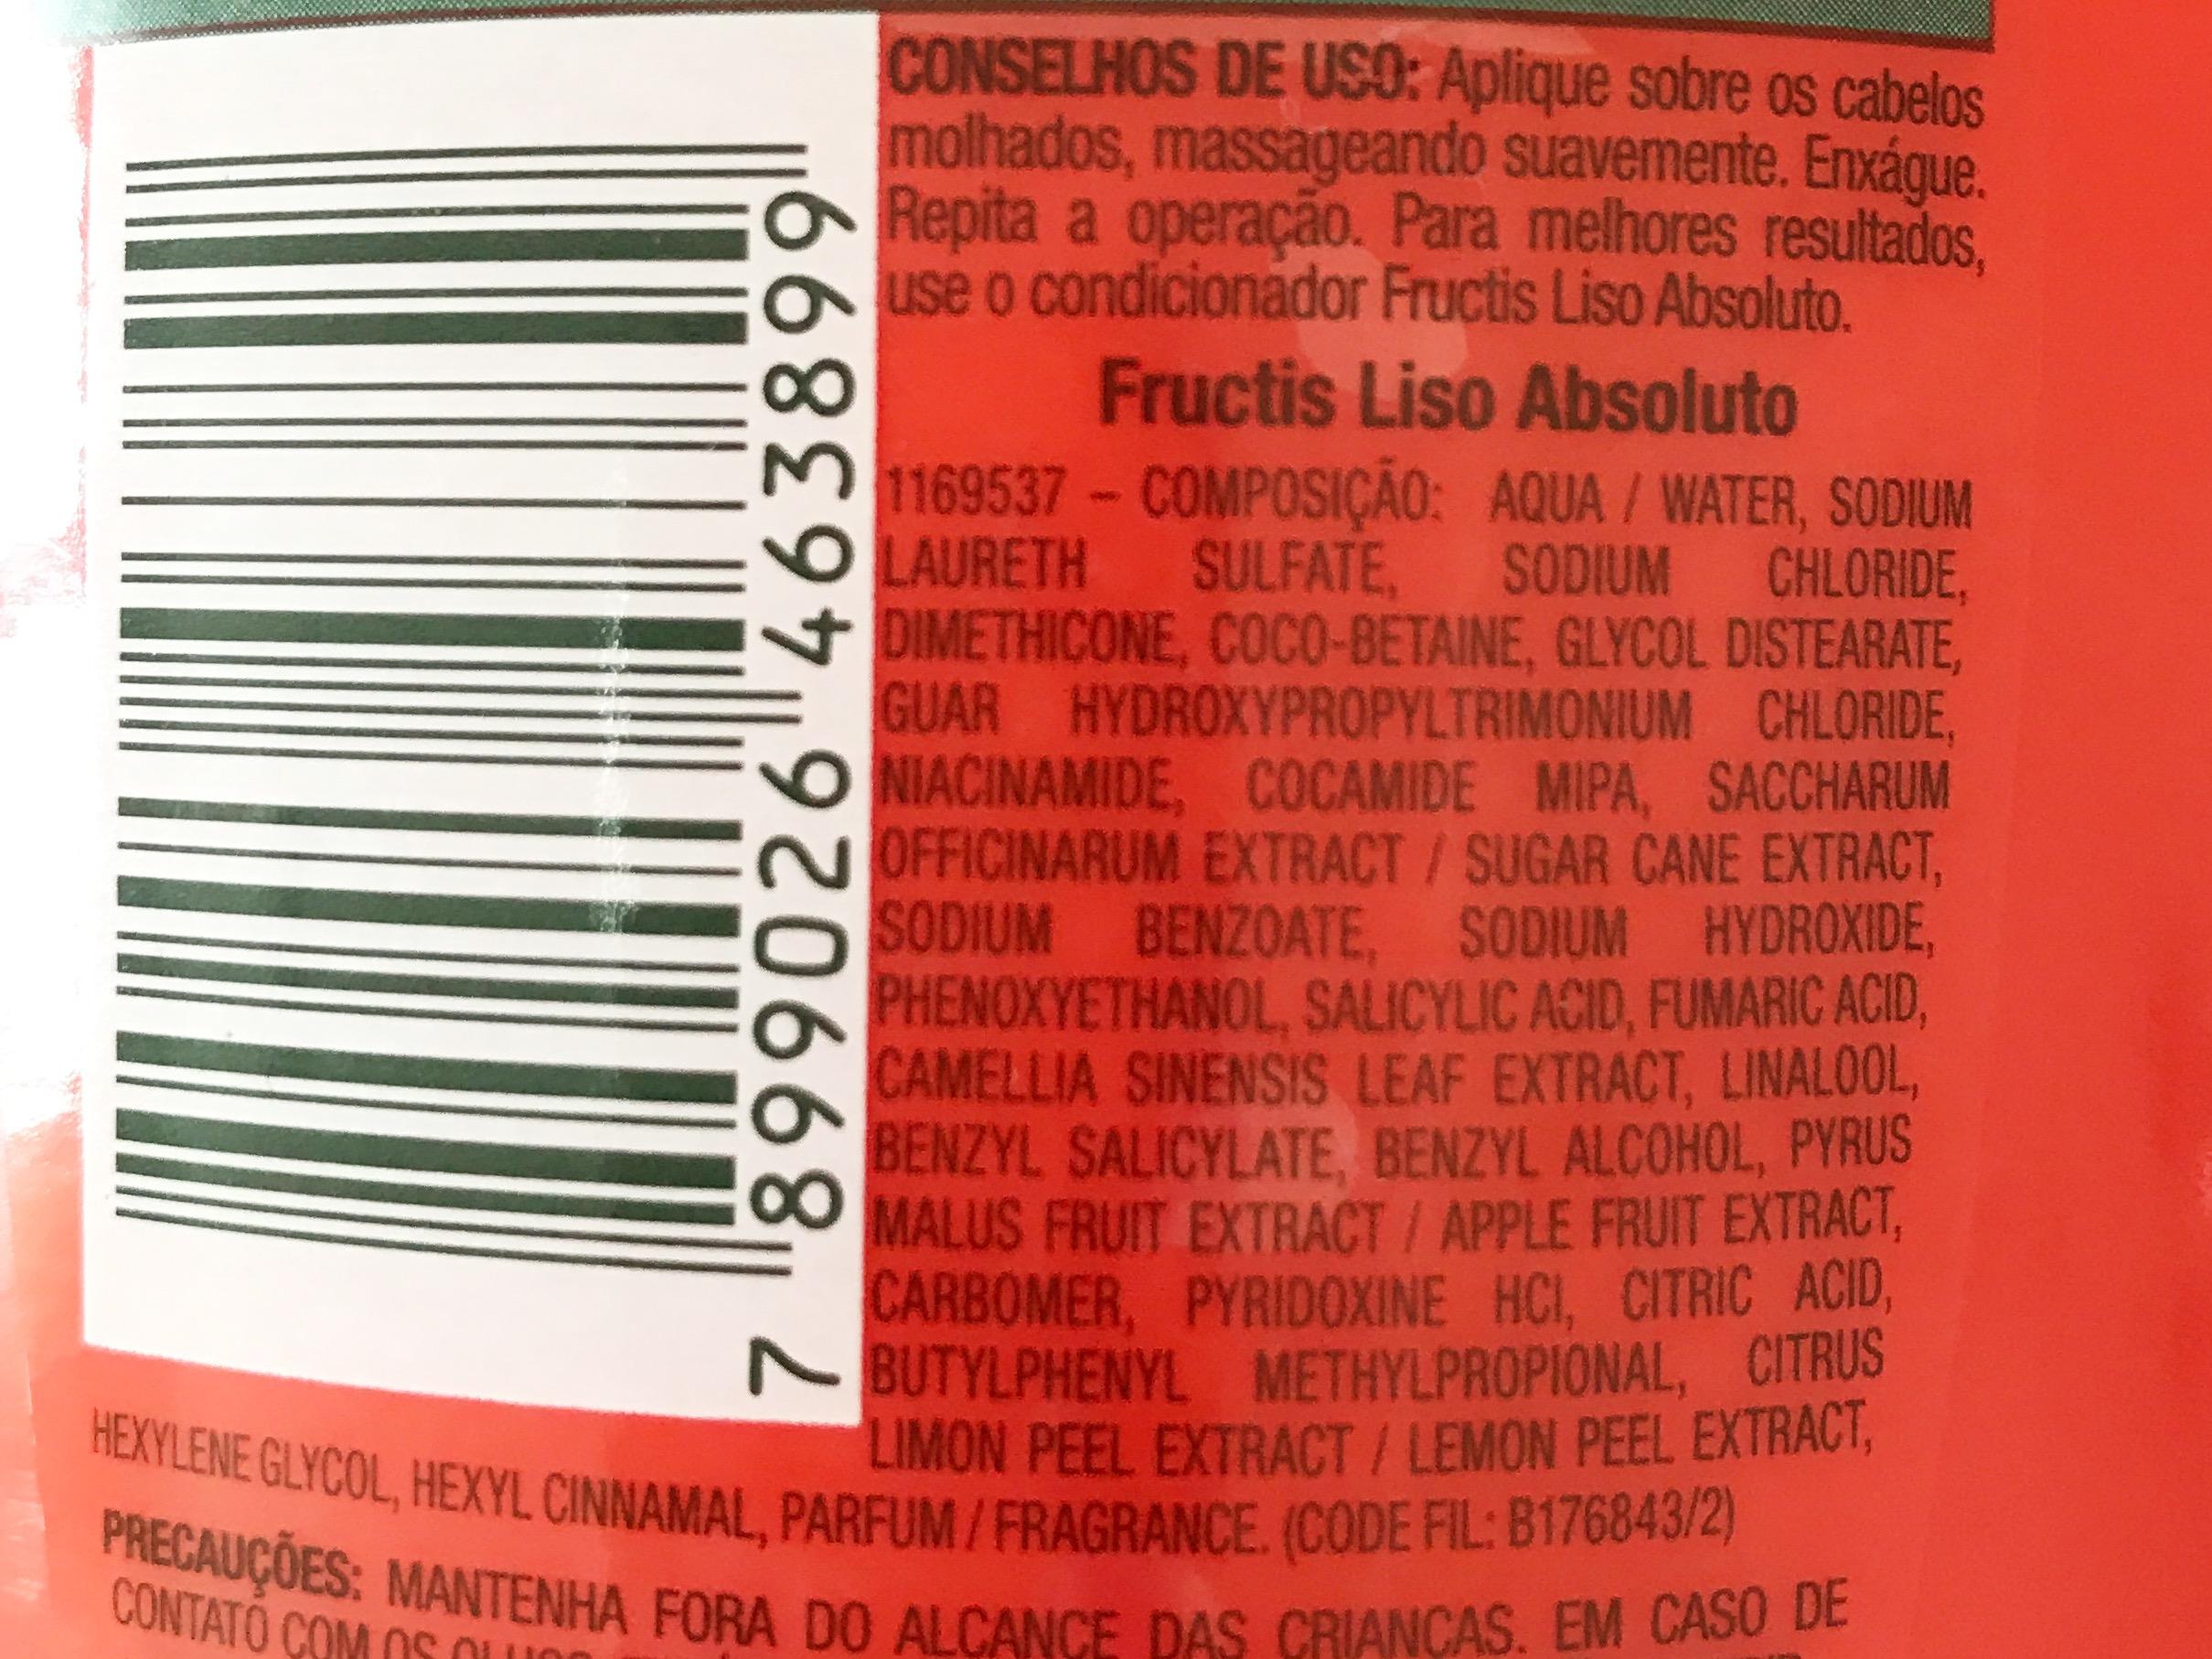 resenha-shampoo-condicionador-fructis-lisoabsoluto-giulicastro (6)